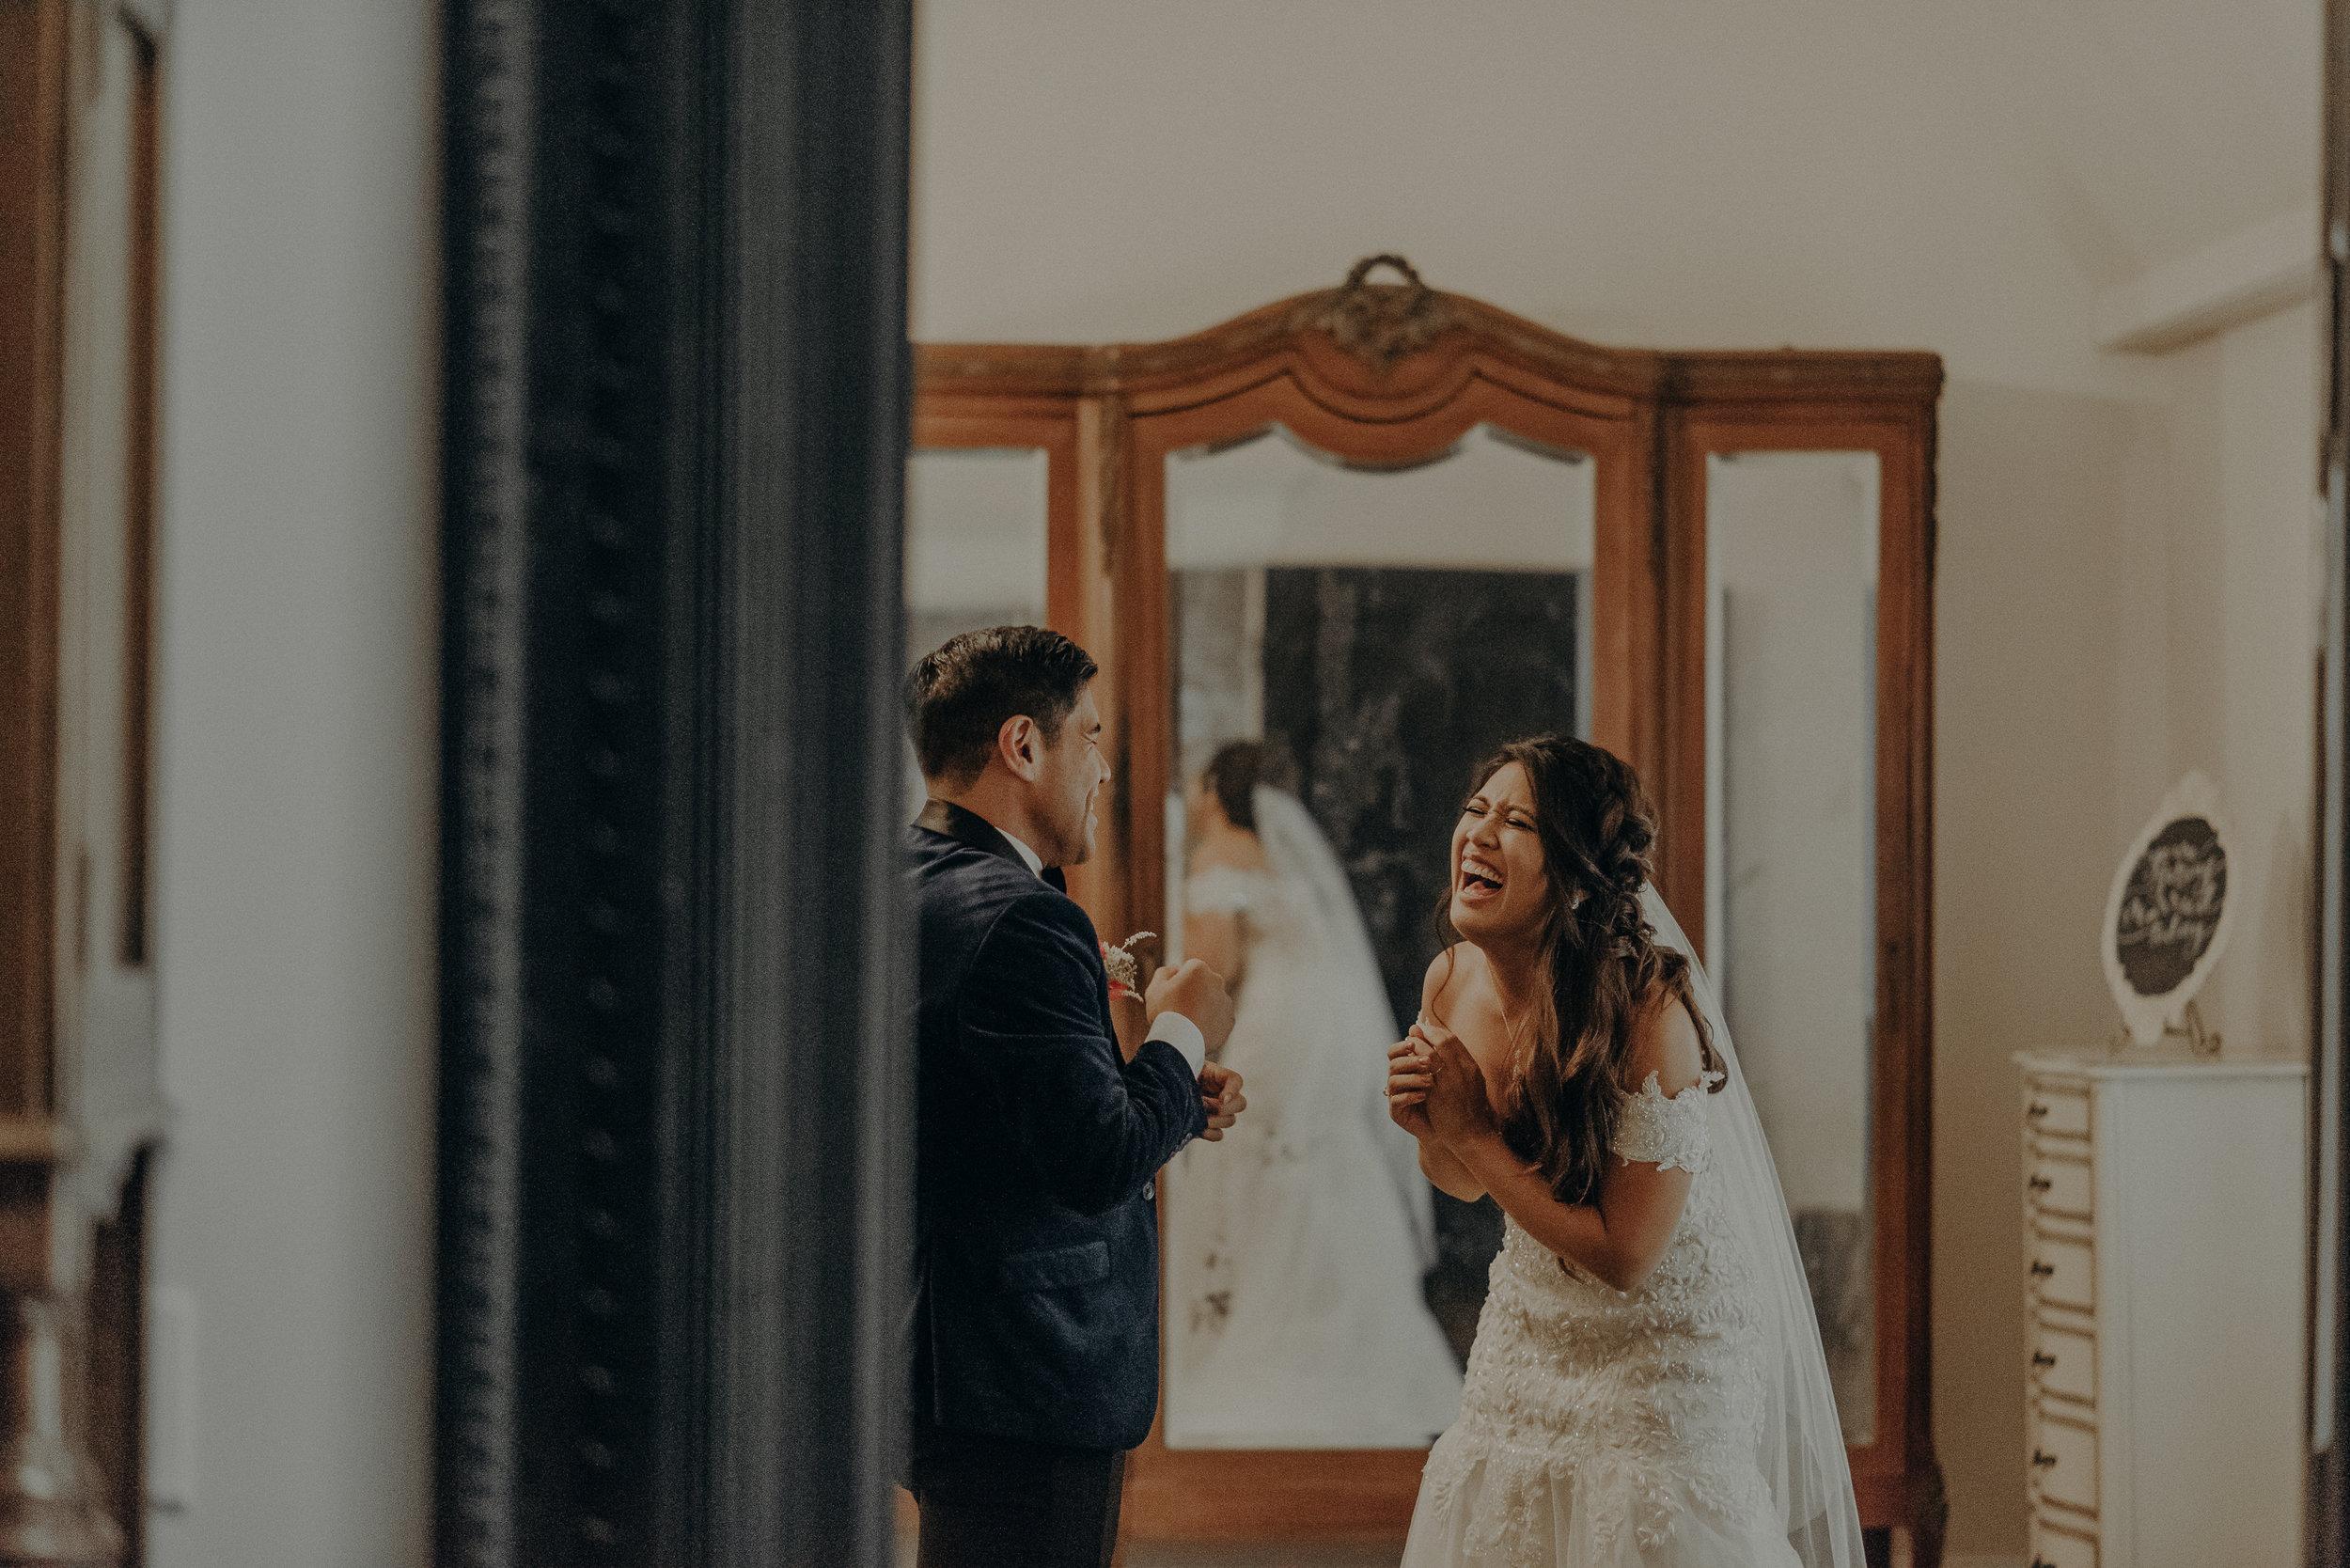 ©Isaiah + Taylor Photography - the Loft on Pine Wedding, Long Beach Wedding Photographer-059.jpg